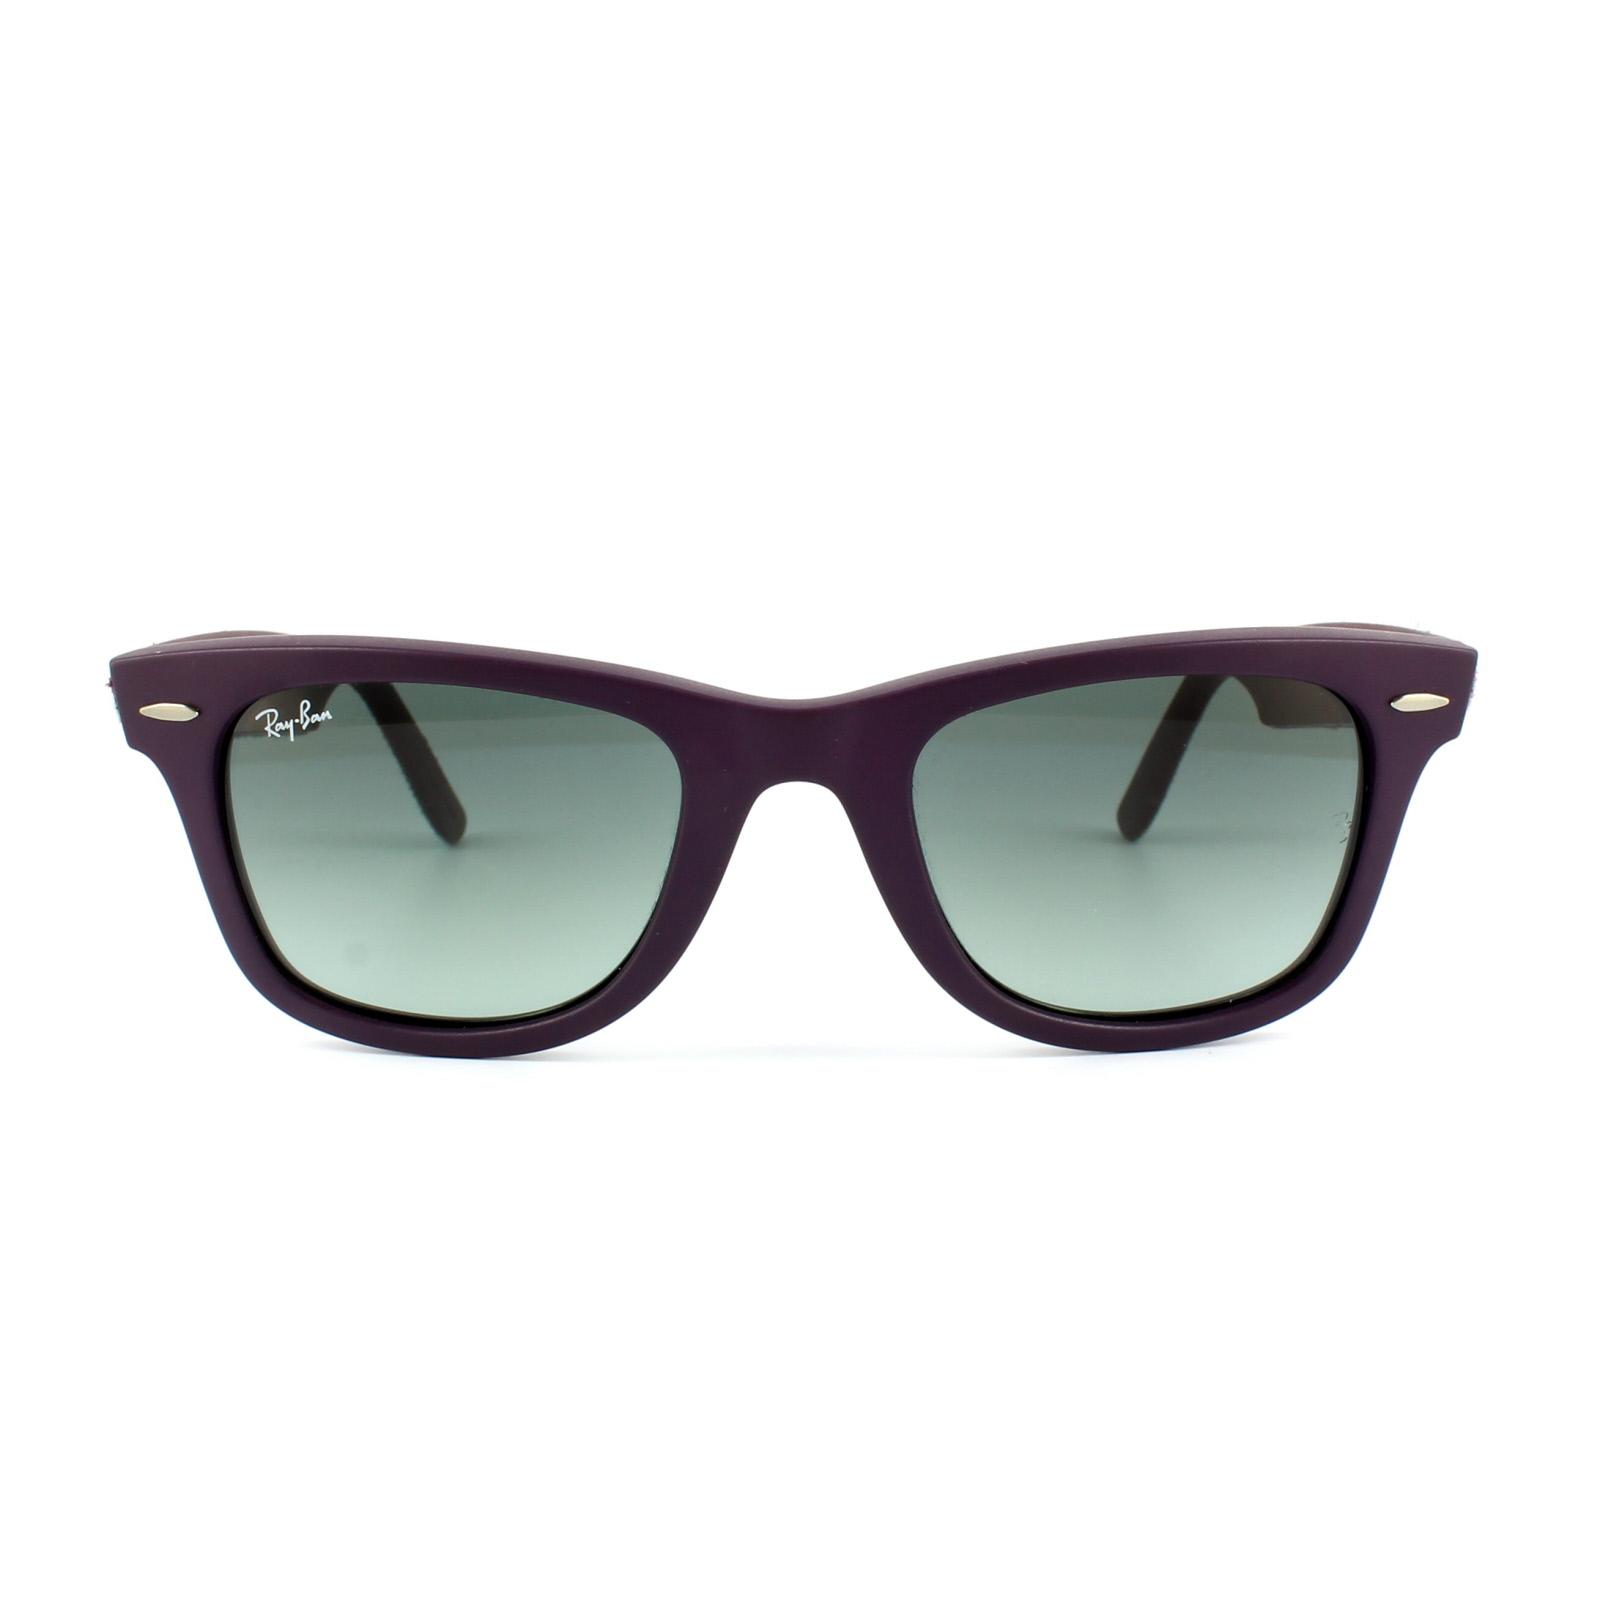 8fcdb60023 Ray-Ban Sunglasses Wayfarer 2140 606471 Violet Camo Grey Gradient Medium  8053672164602